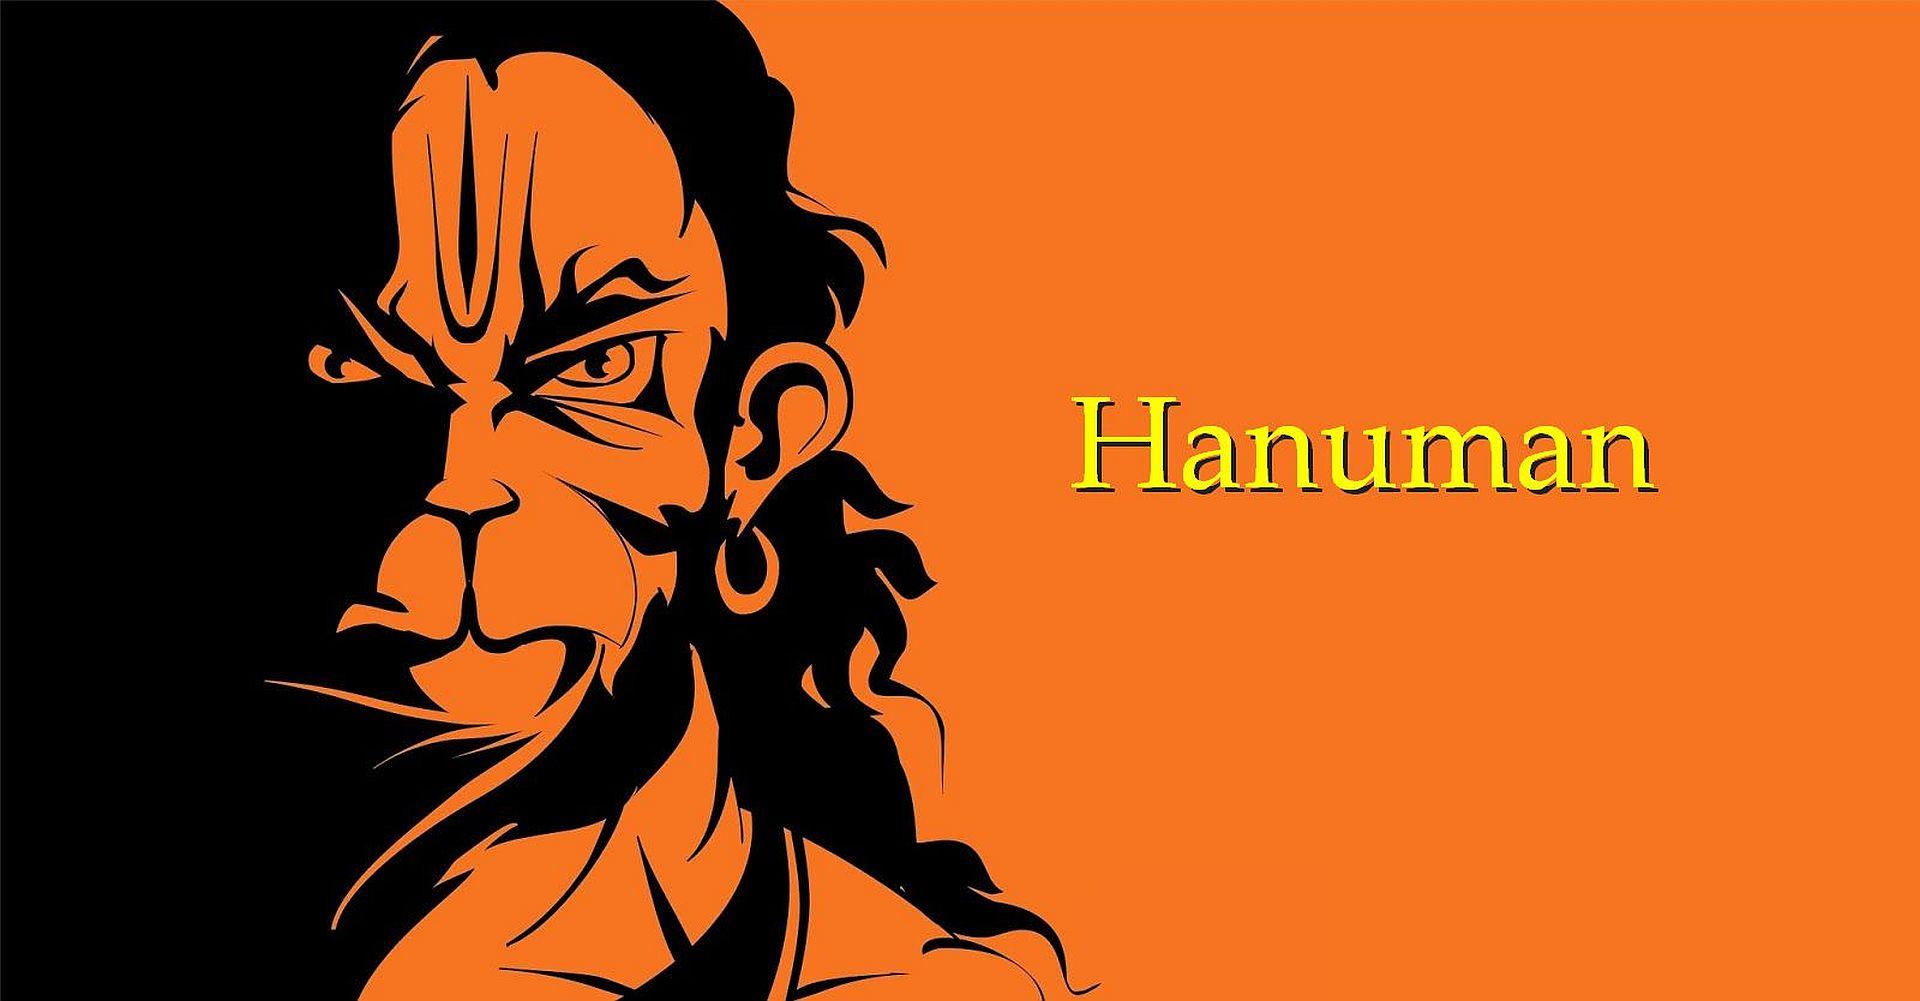 God Ganesh Hd Wallpaper Hanuman Hd Wallpapers 1080p God Hd Wallpapers